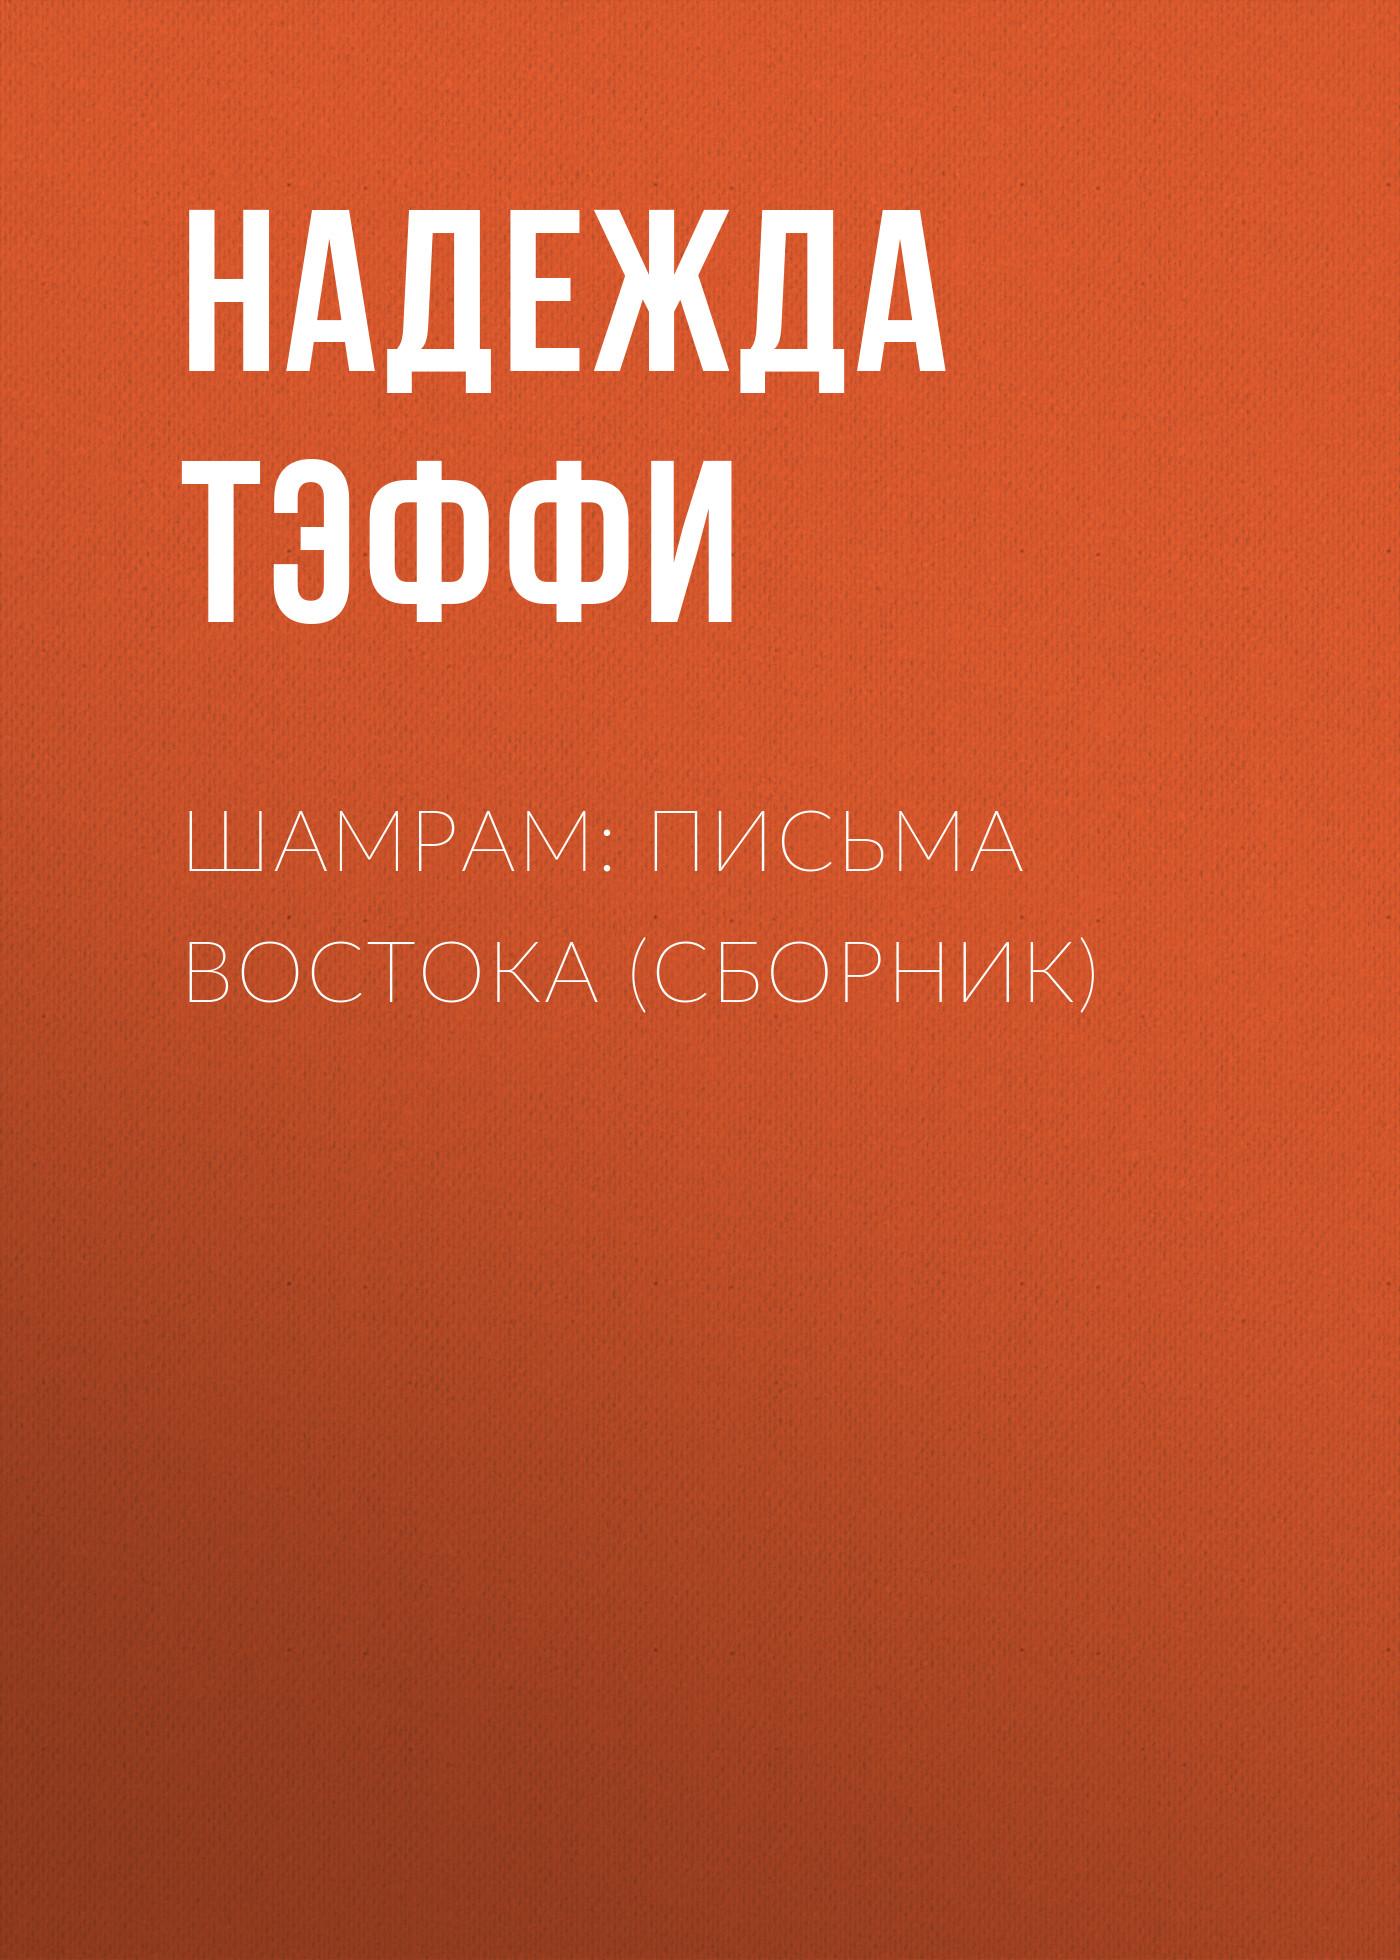 Надежда Тэффи Шамрам: письма Востока (сборник) надежда тэффи чудит